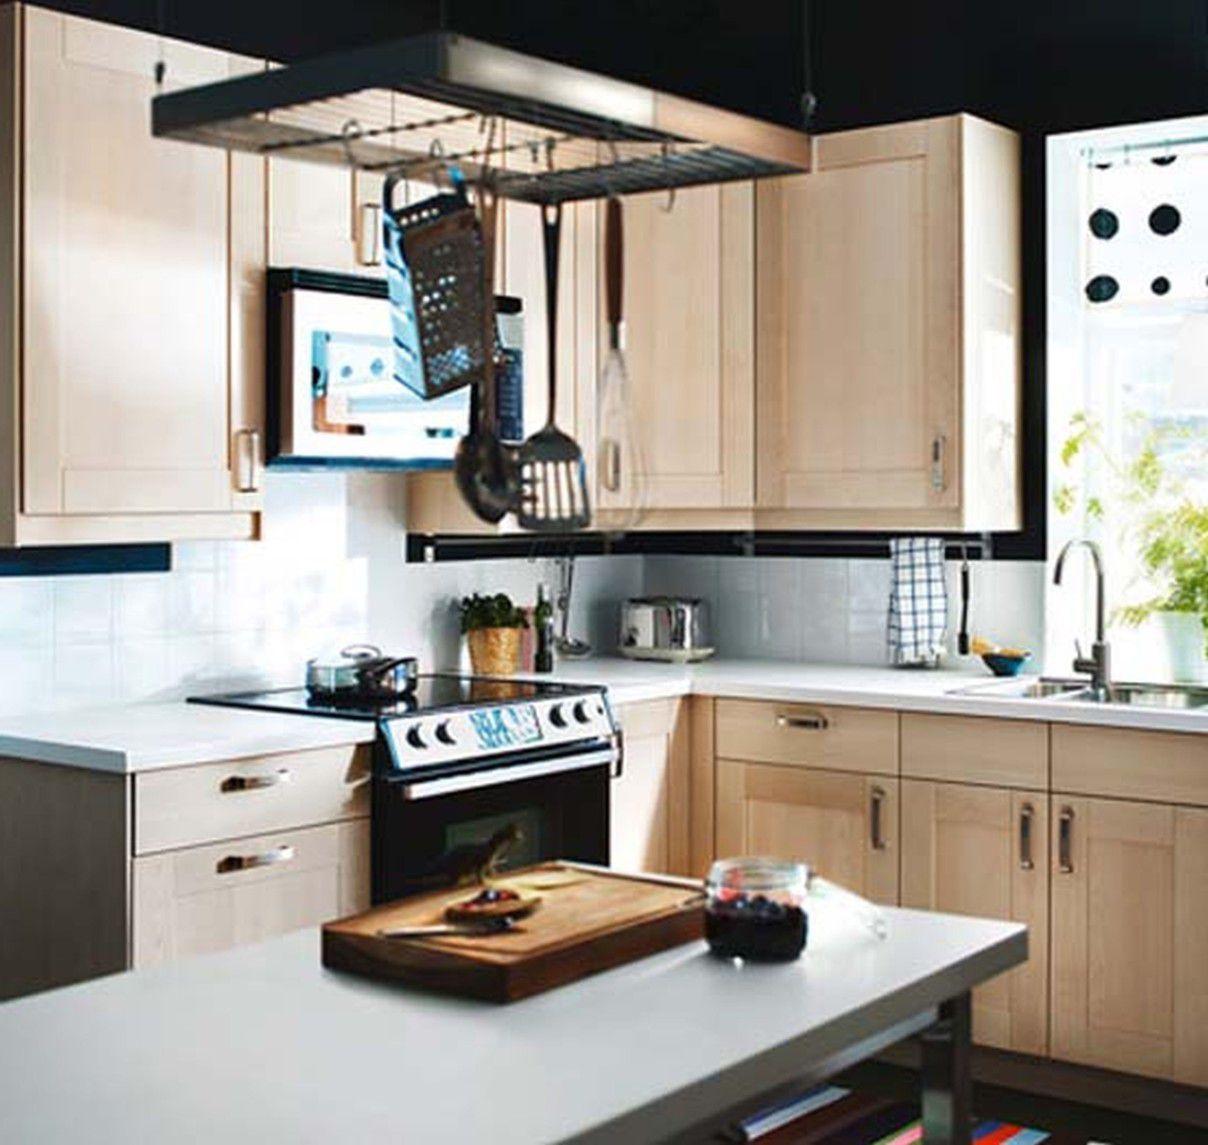 Benefits Of Electric Kitchen Appliances Kitchen design